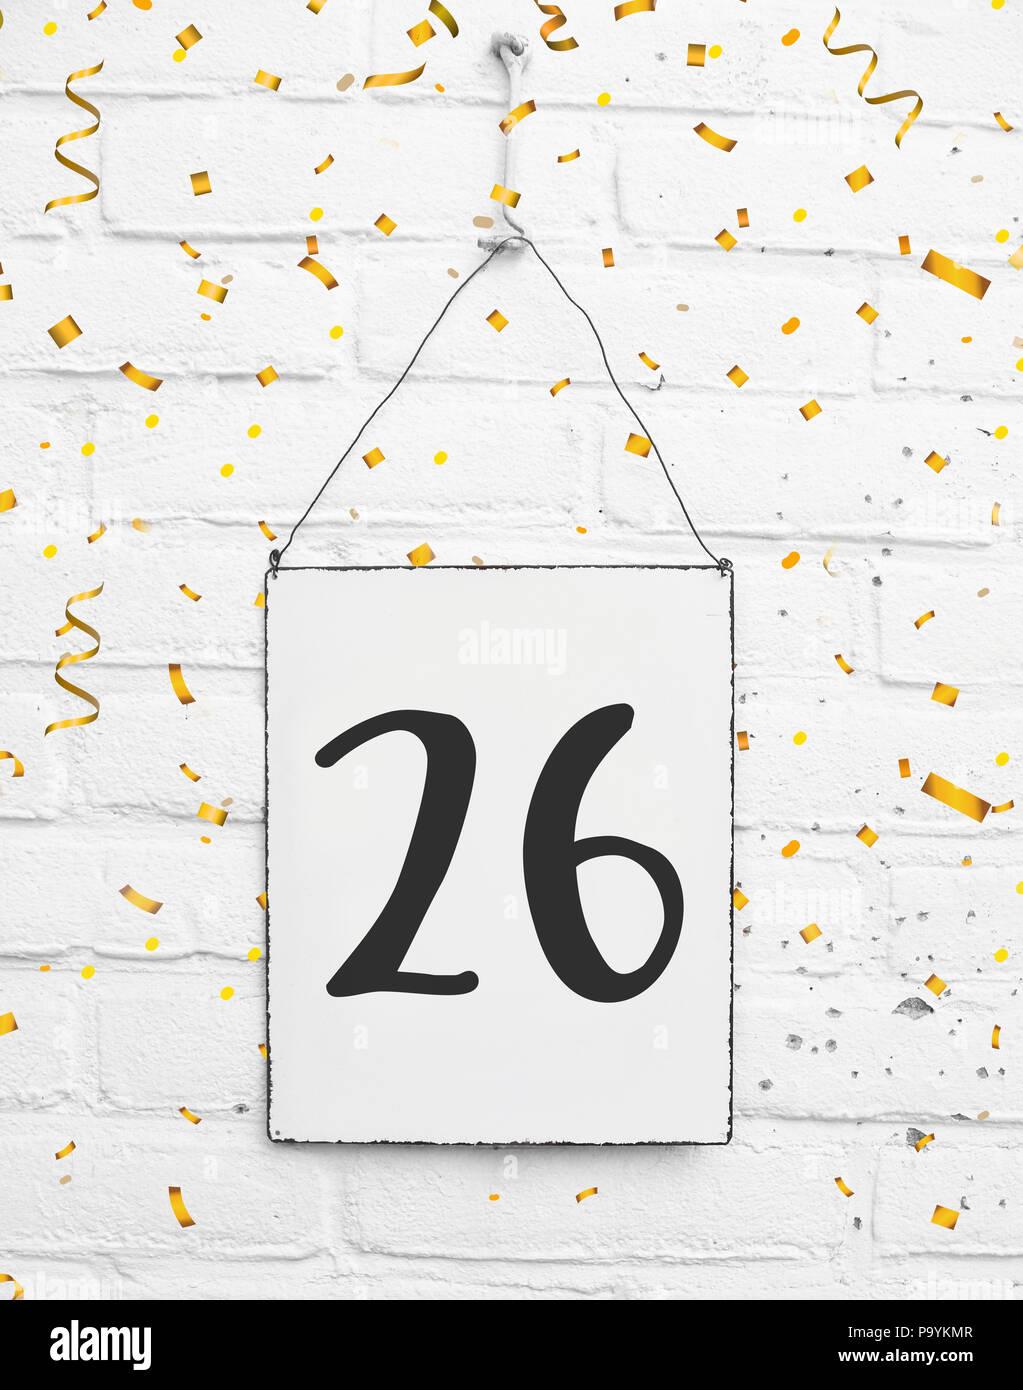 26 geburtstag Buddha's Birthday